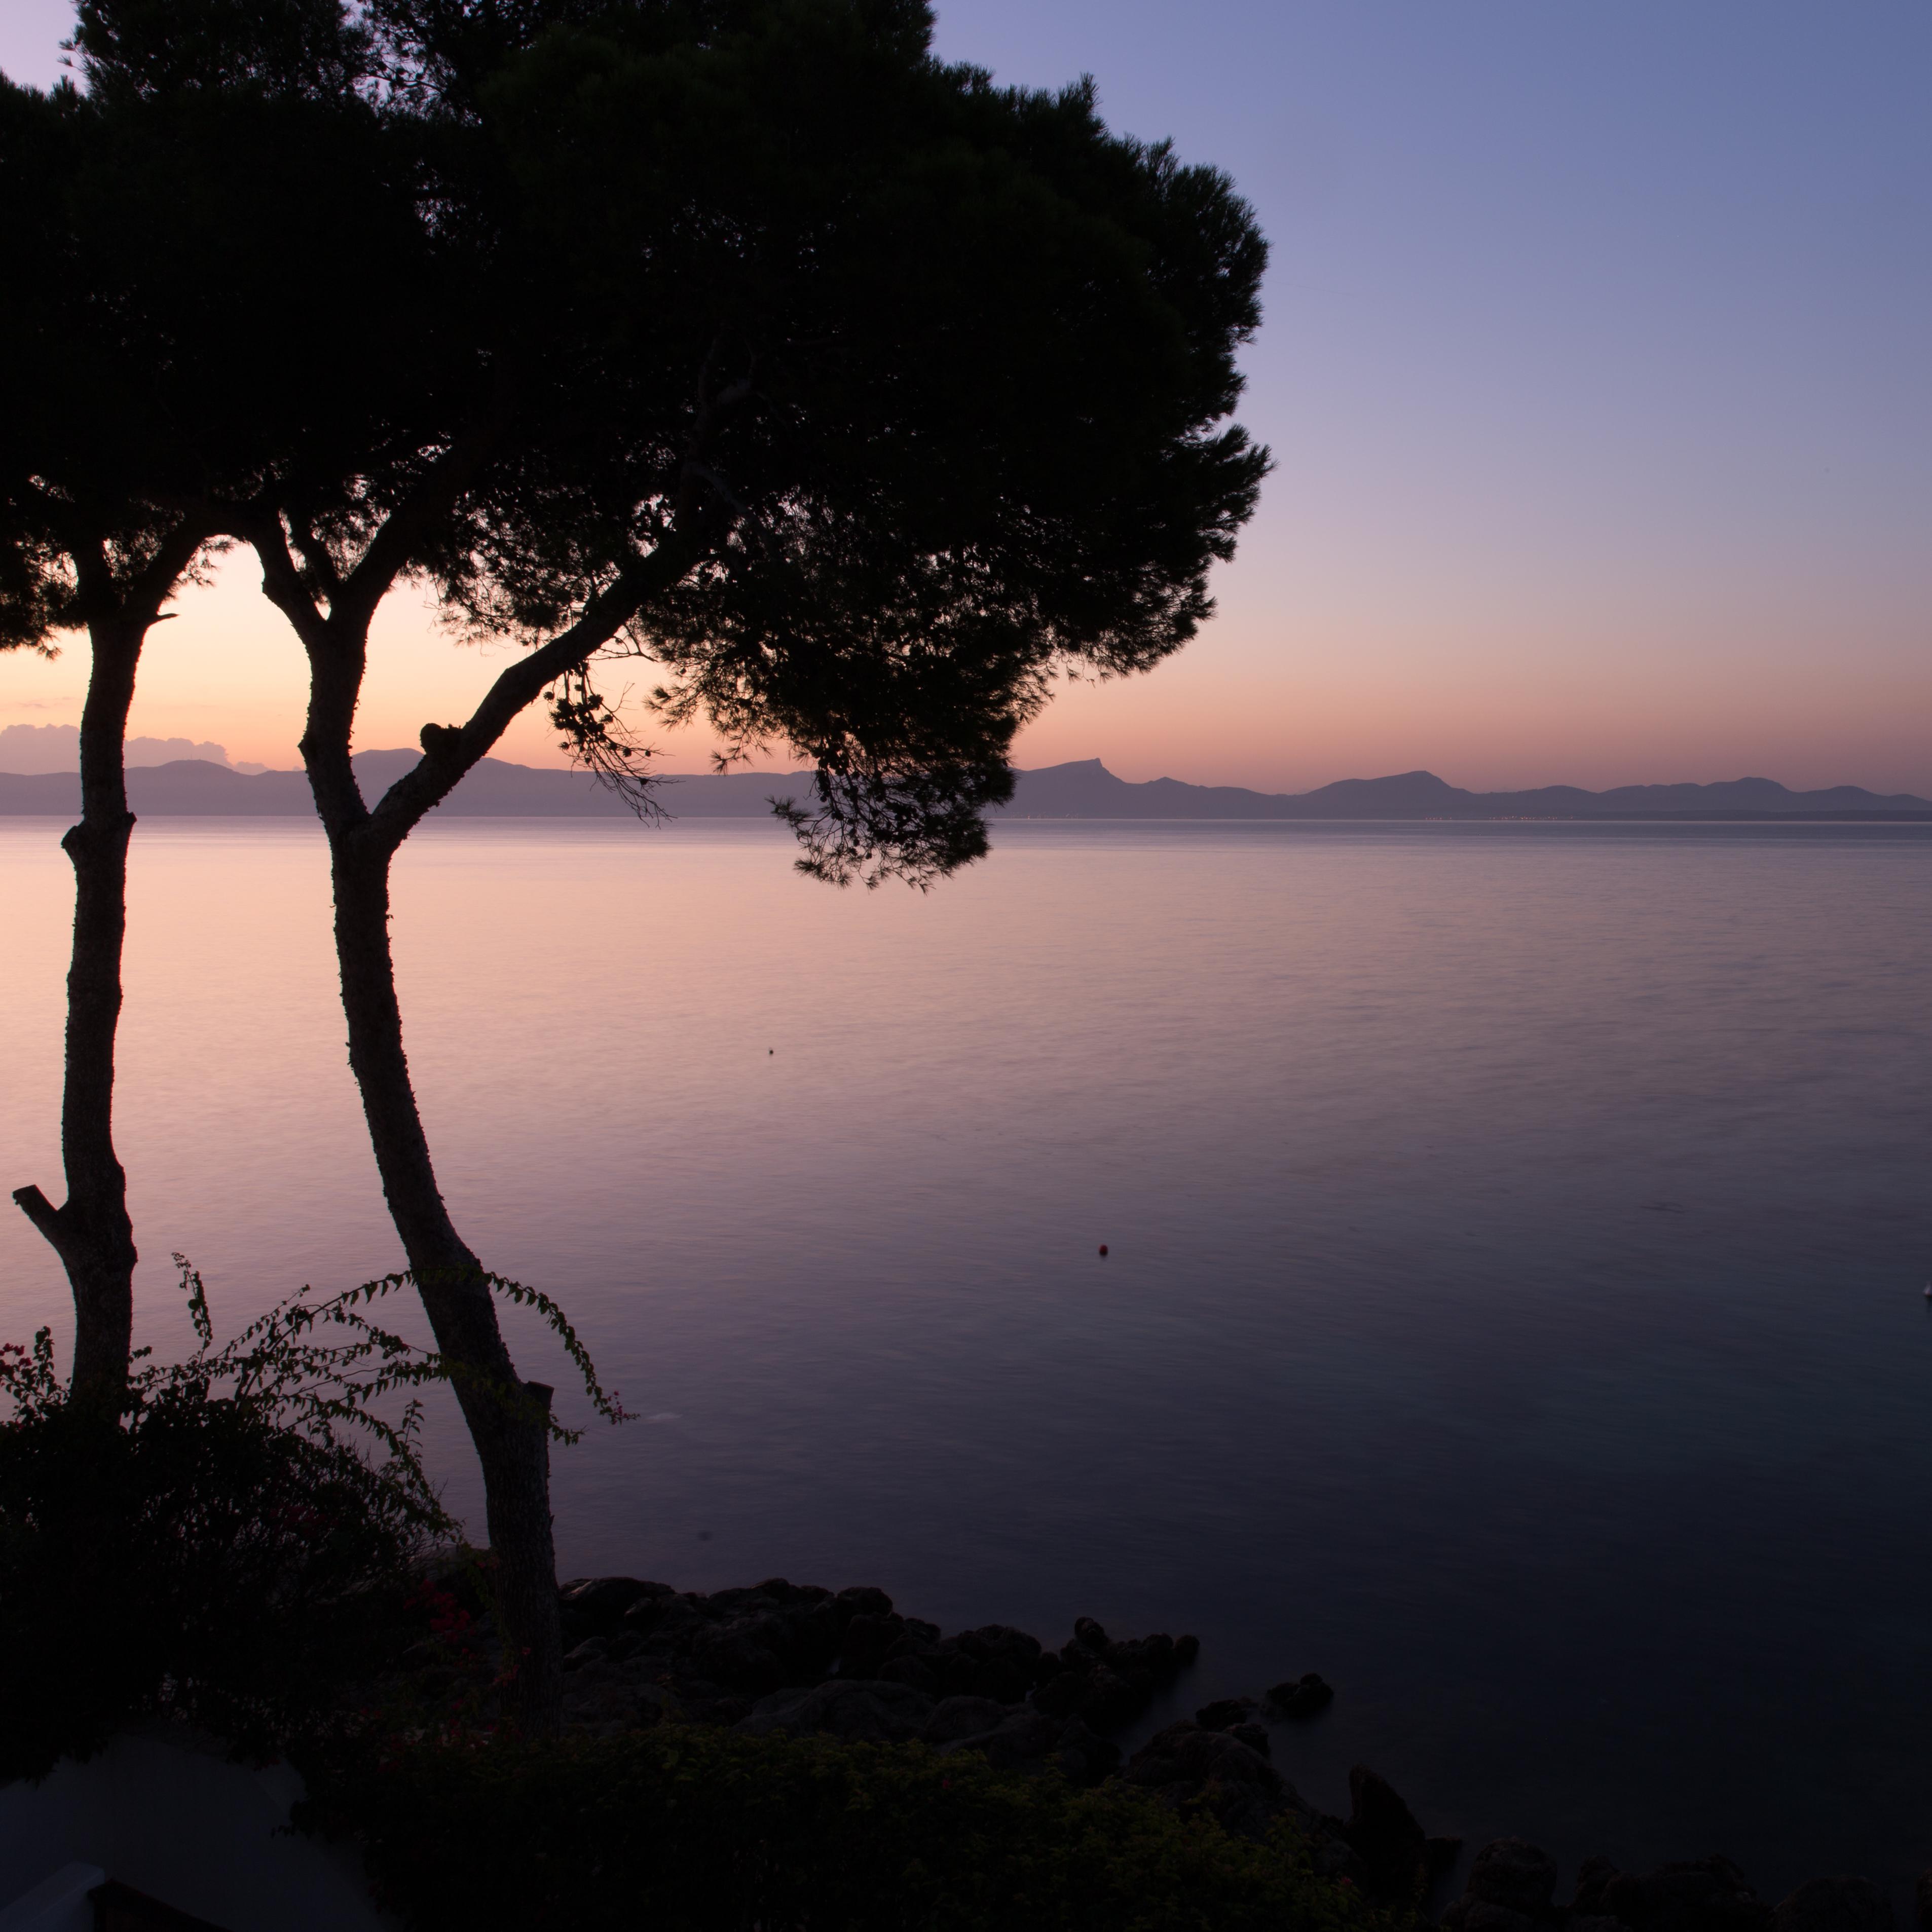 Sonnenaufgang am Meer mit Silhouette eines Baumes